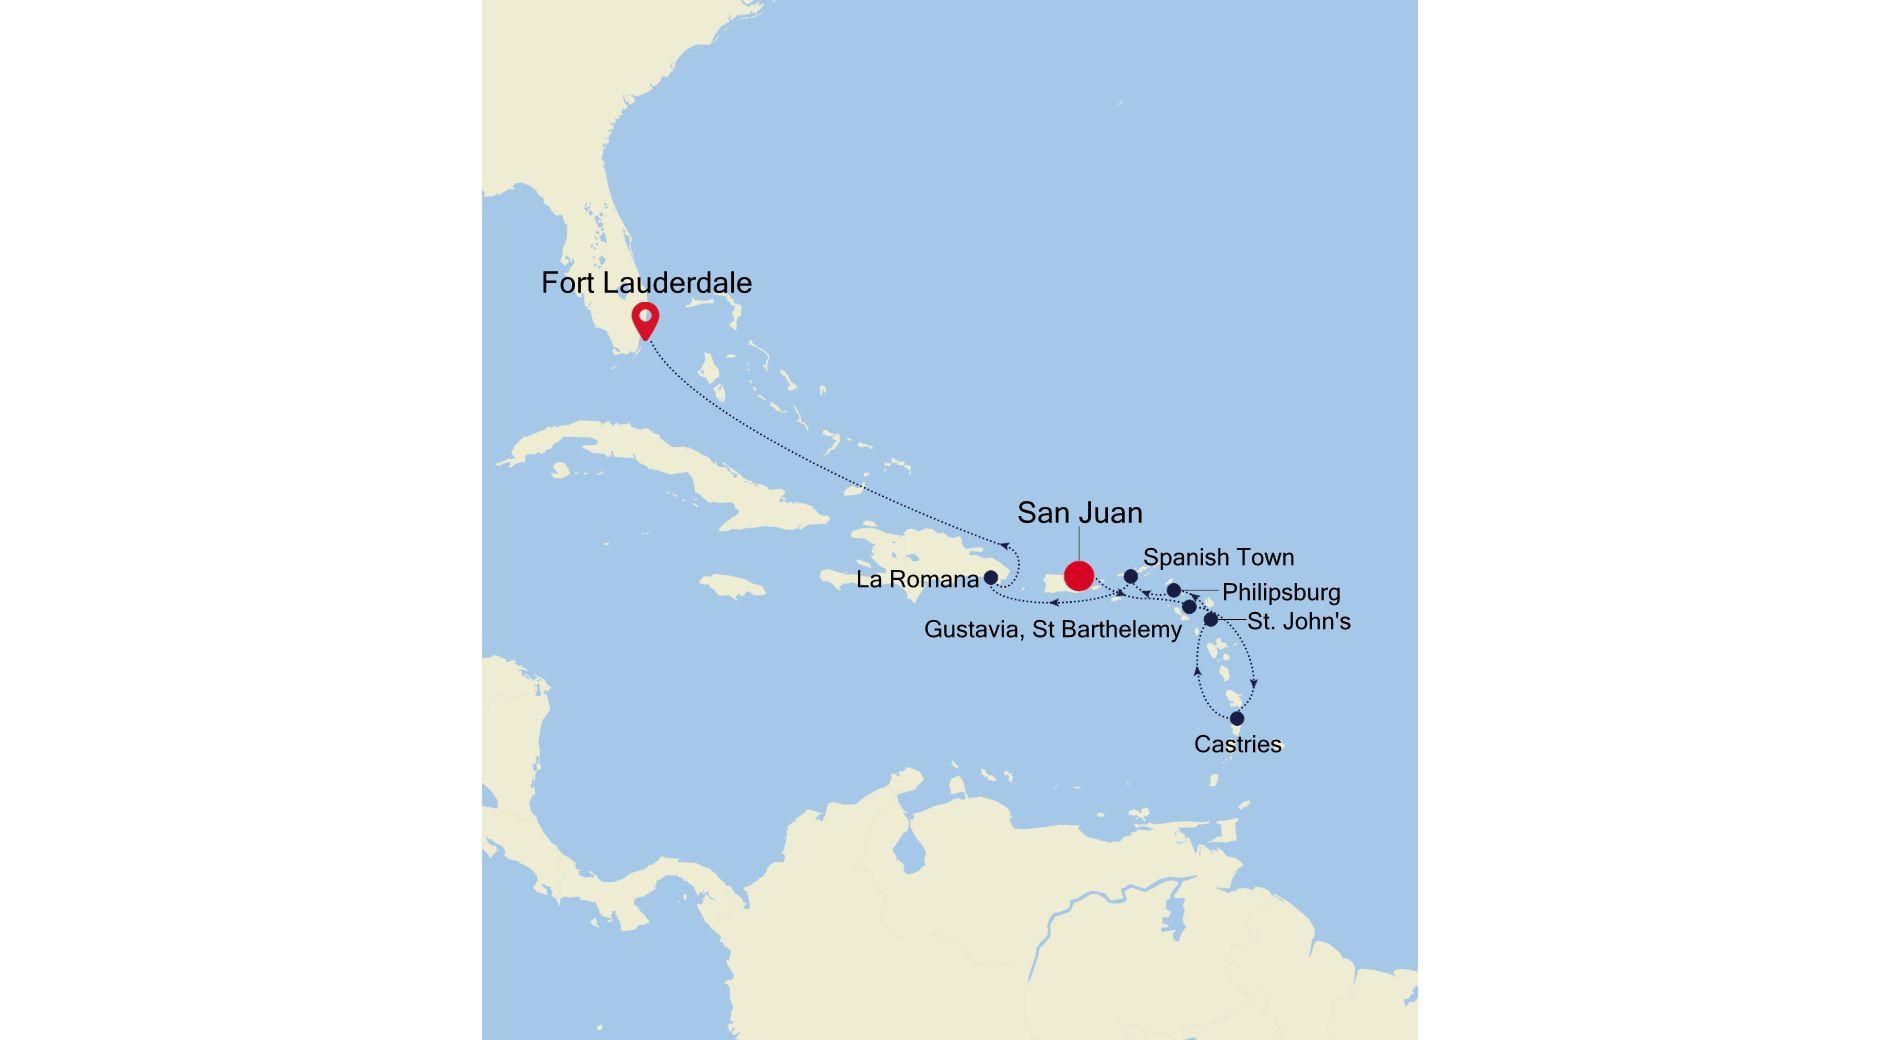 2934 - San Juan nach Fort Lauderdale